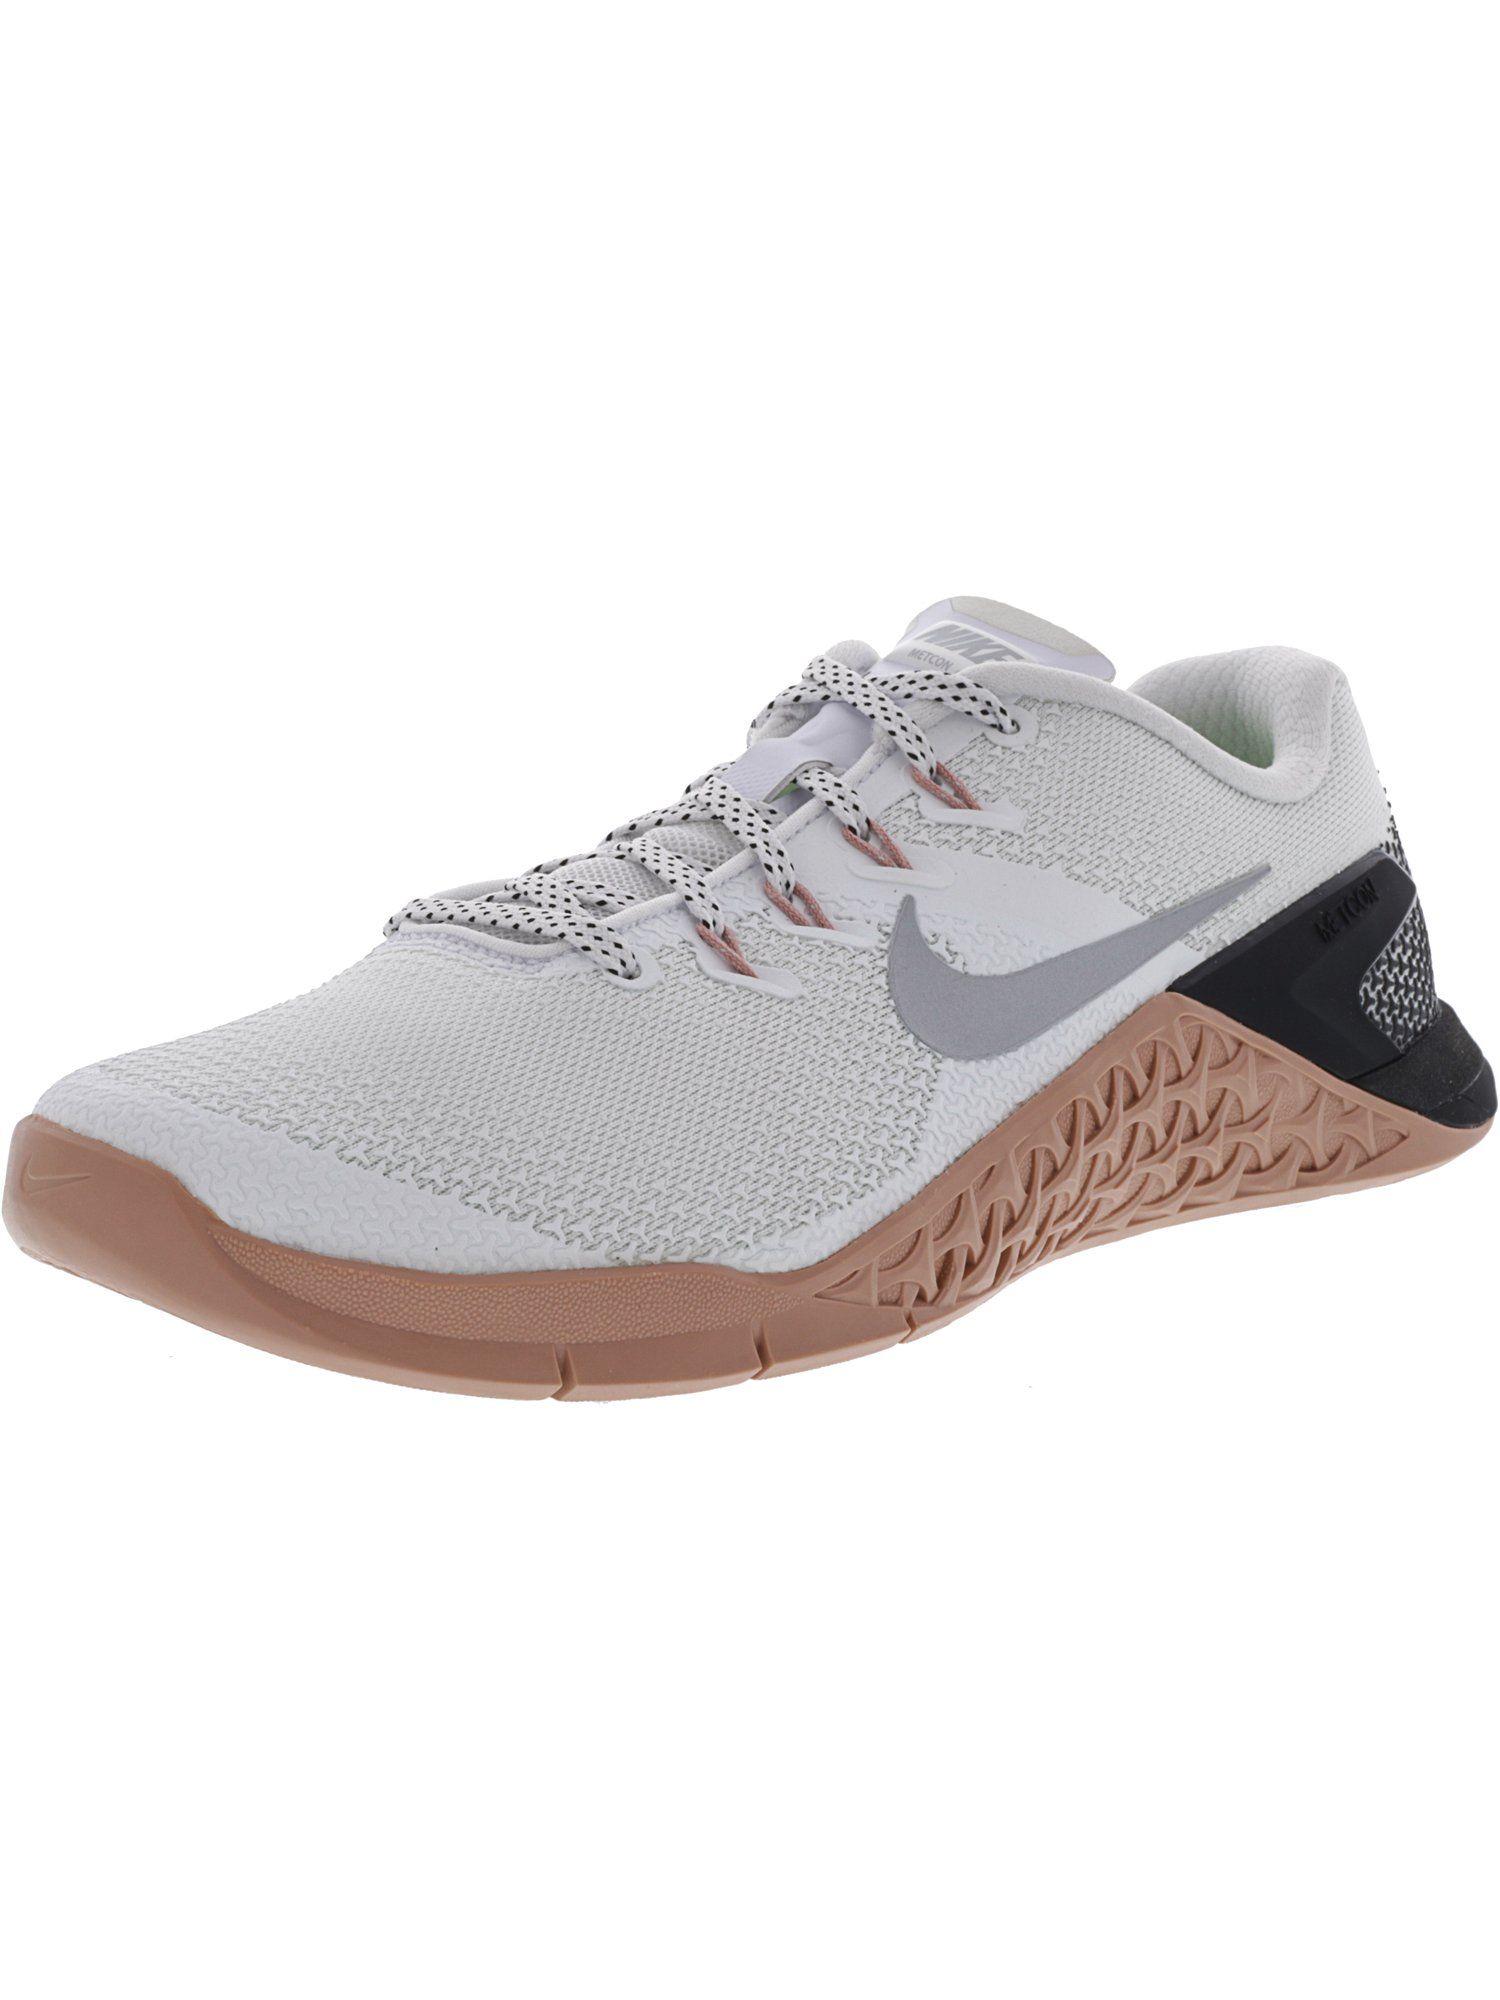 ModeSens   Shoes trainers, Nike women, Nike